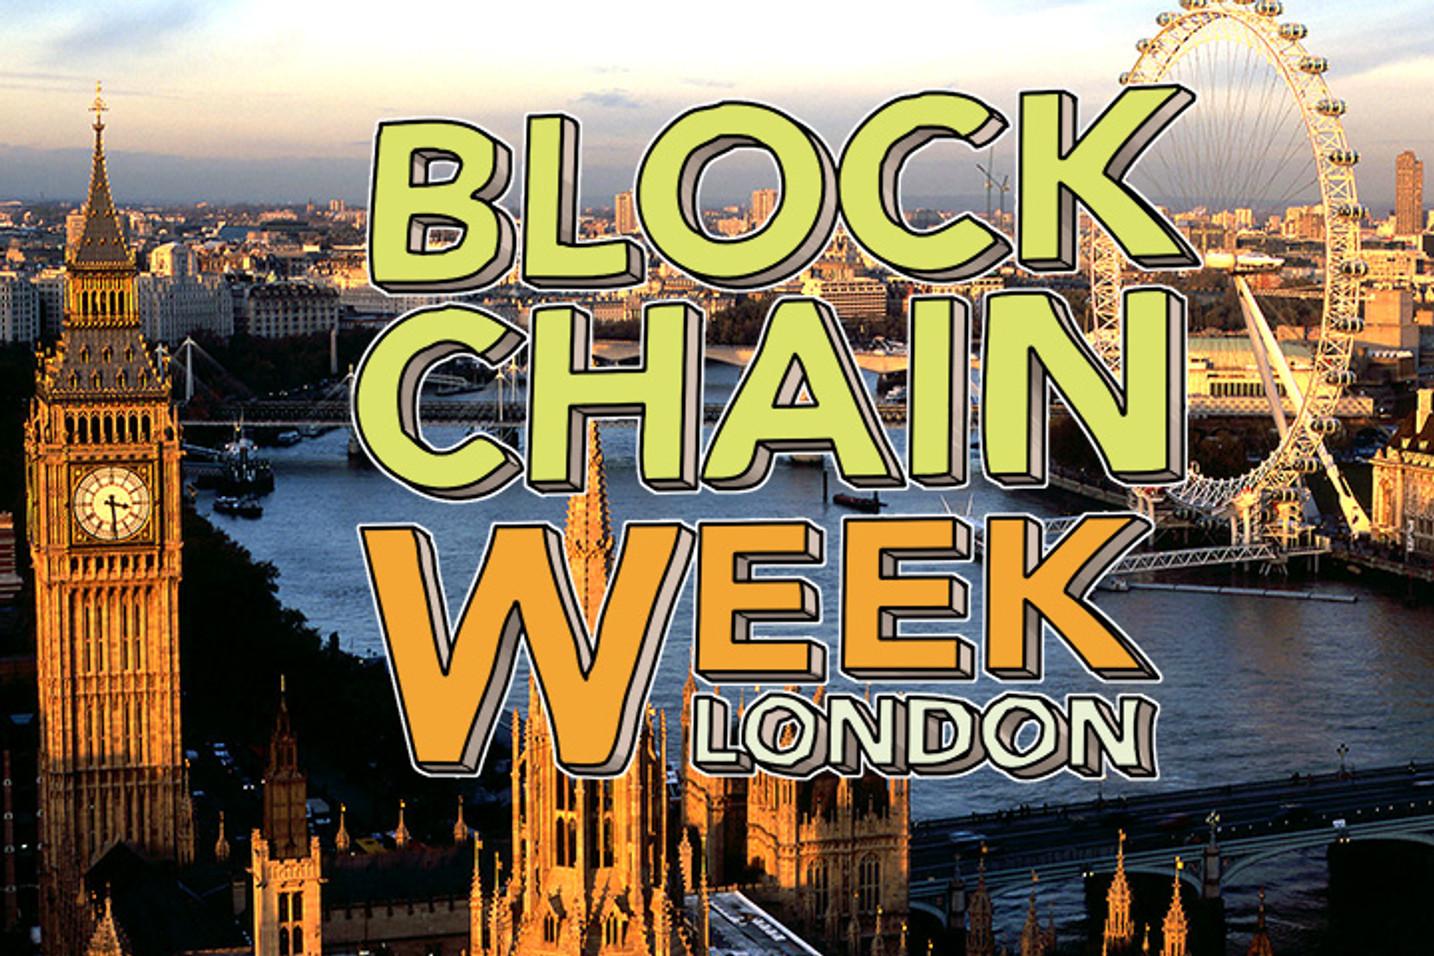 UNICEF, UK Home Office and BTCC to speak at London Blockchain Week 2017